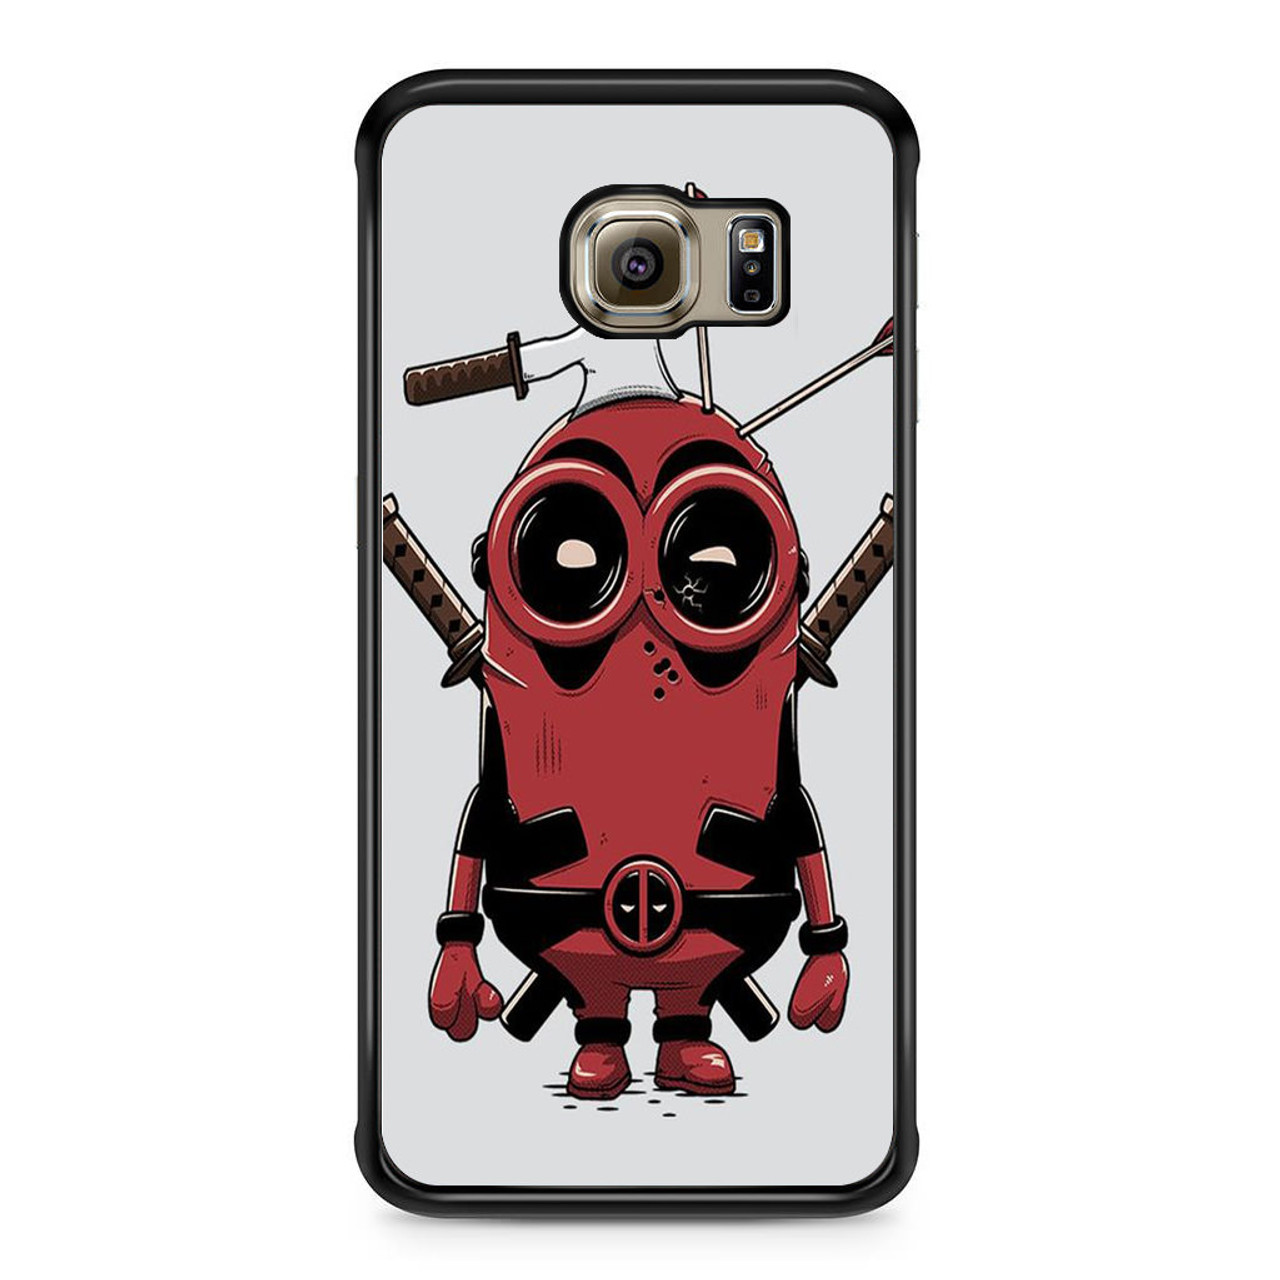 huge discount 6293f db500 Deadpool Minions Samsung Galaxy S6 Edge Case